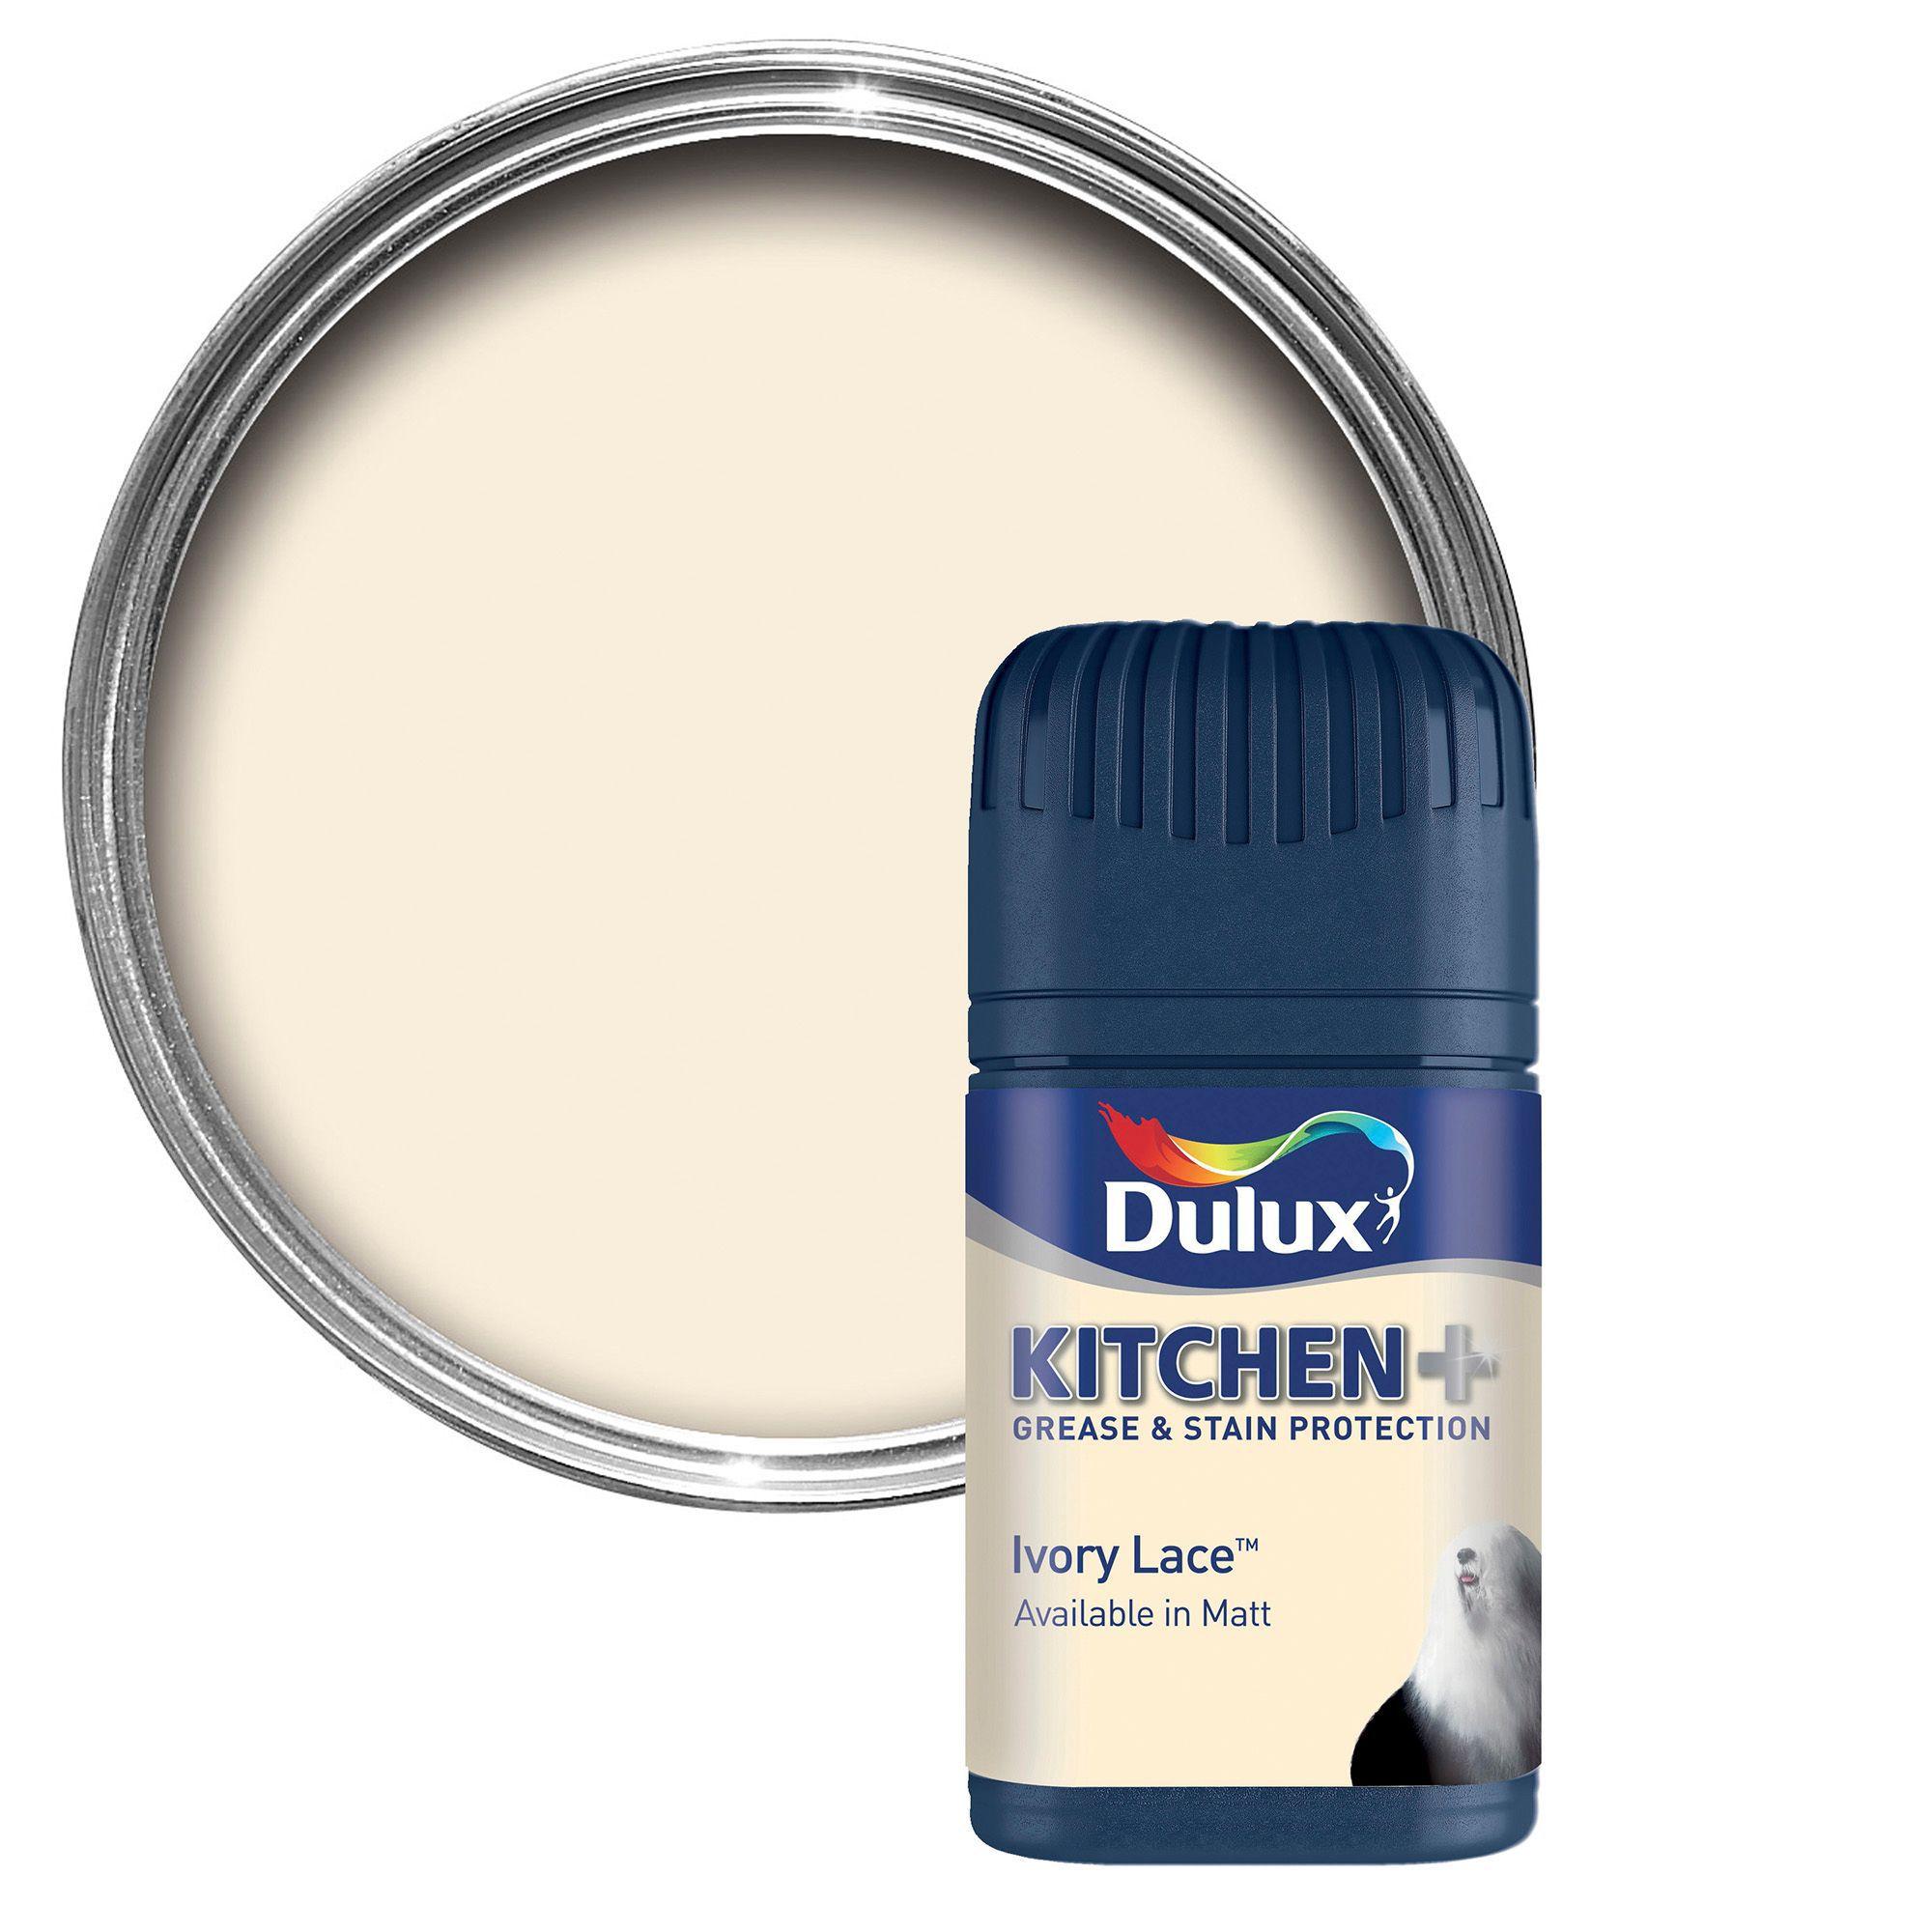 Dulux Kitchen Ivory Lace Matt Emulsion Paint 50ml Tester Pot